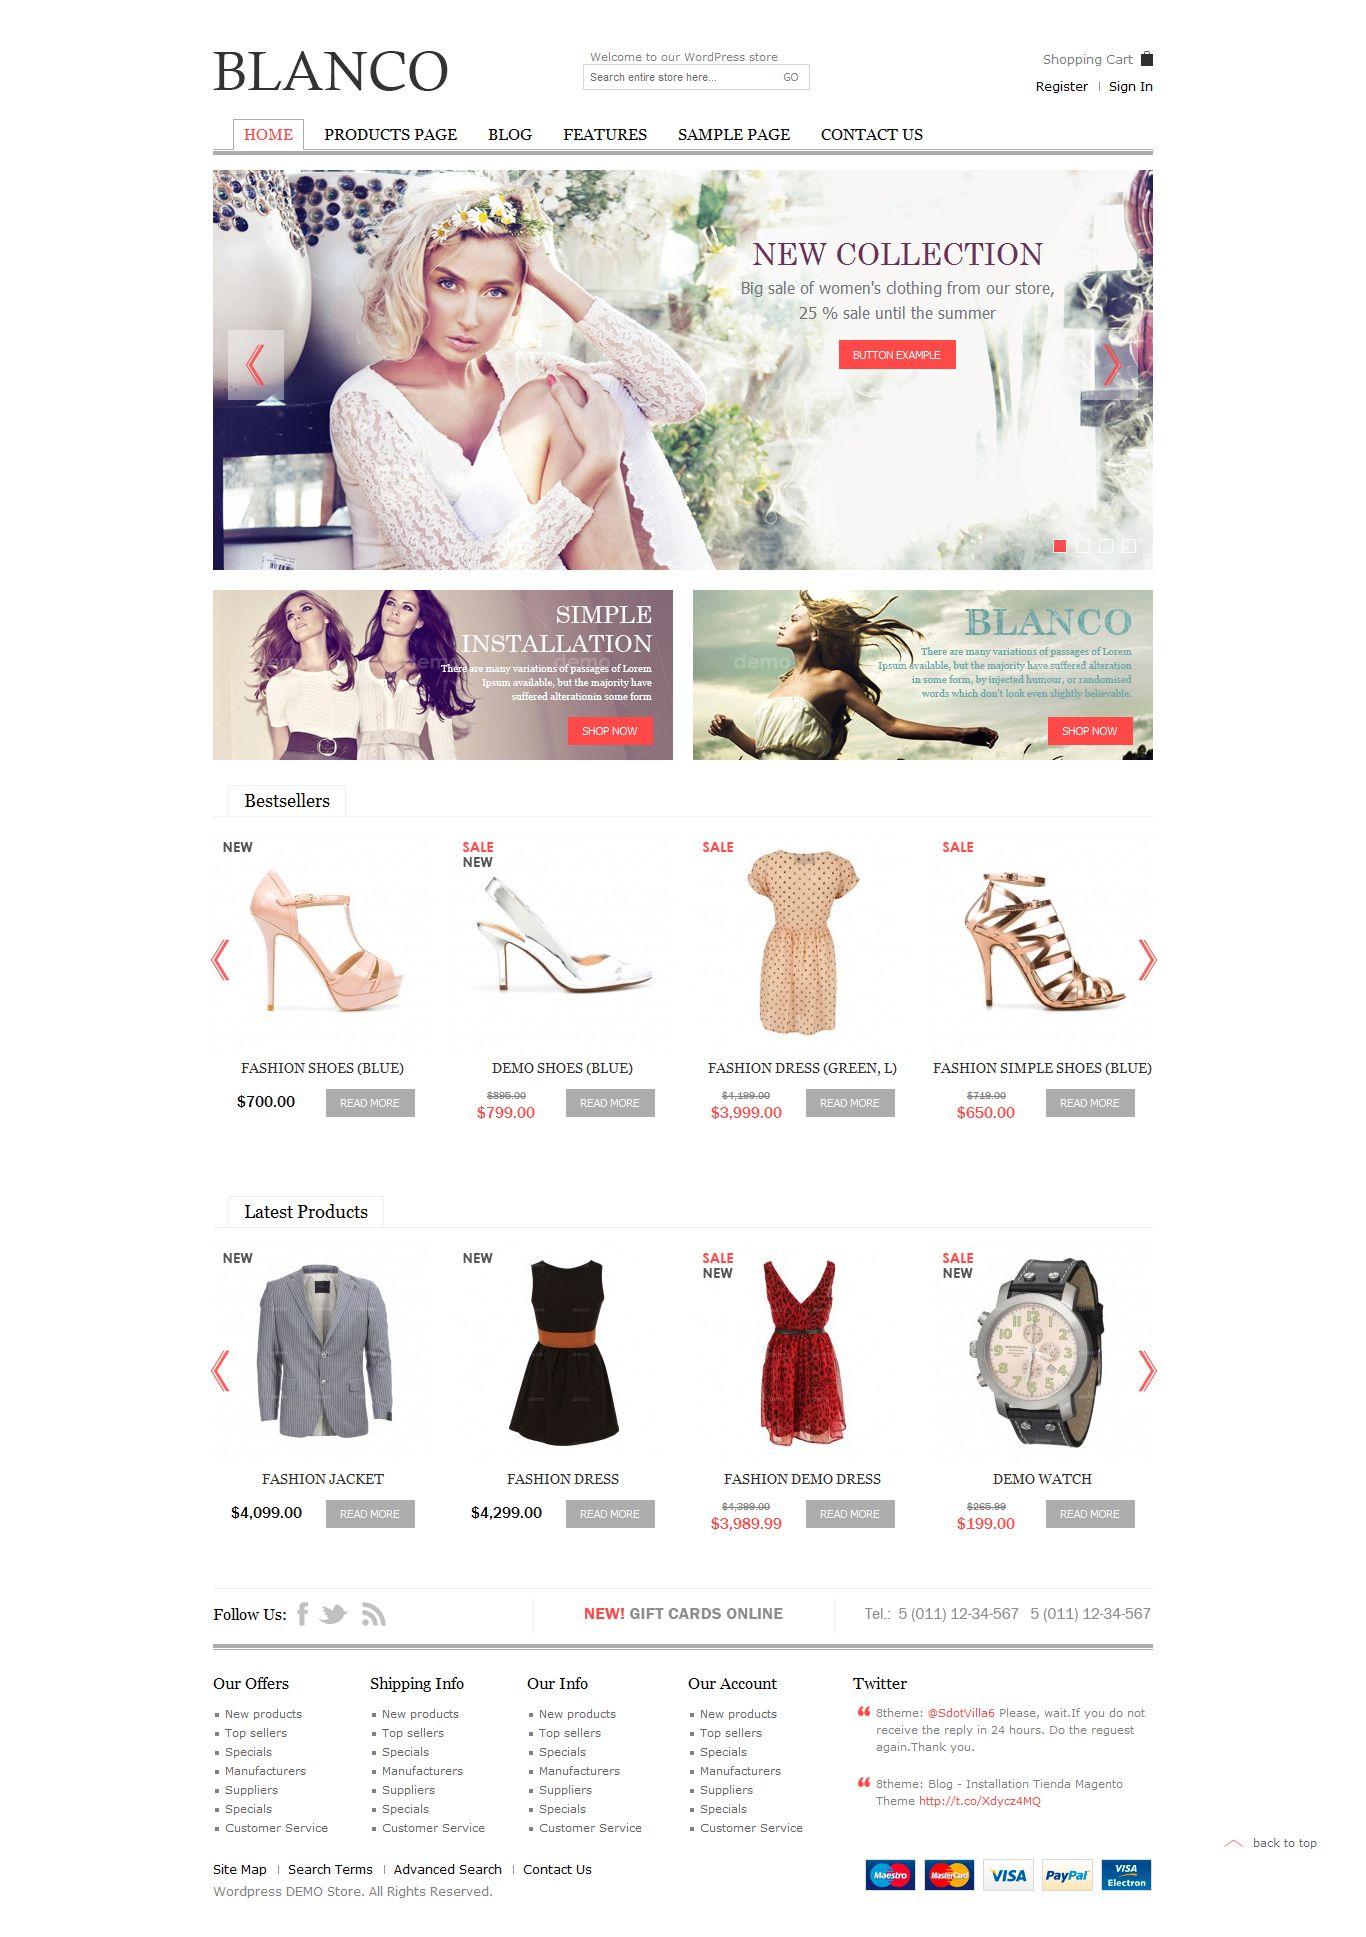 Blanco - Responsive WordPress Woo/E-Commerce Theme • Download ...